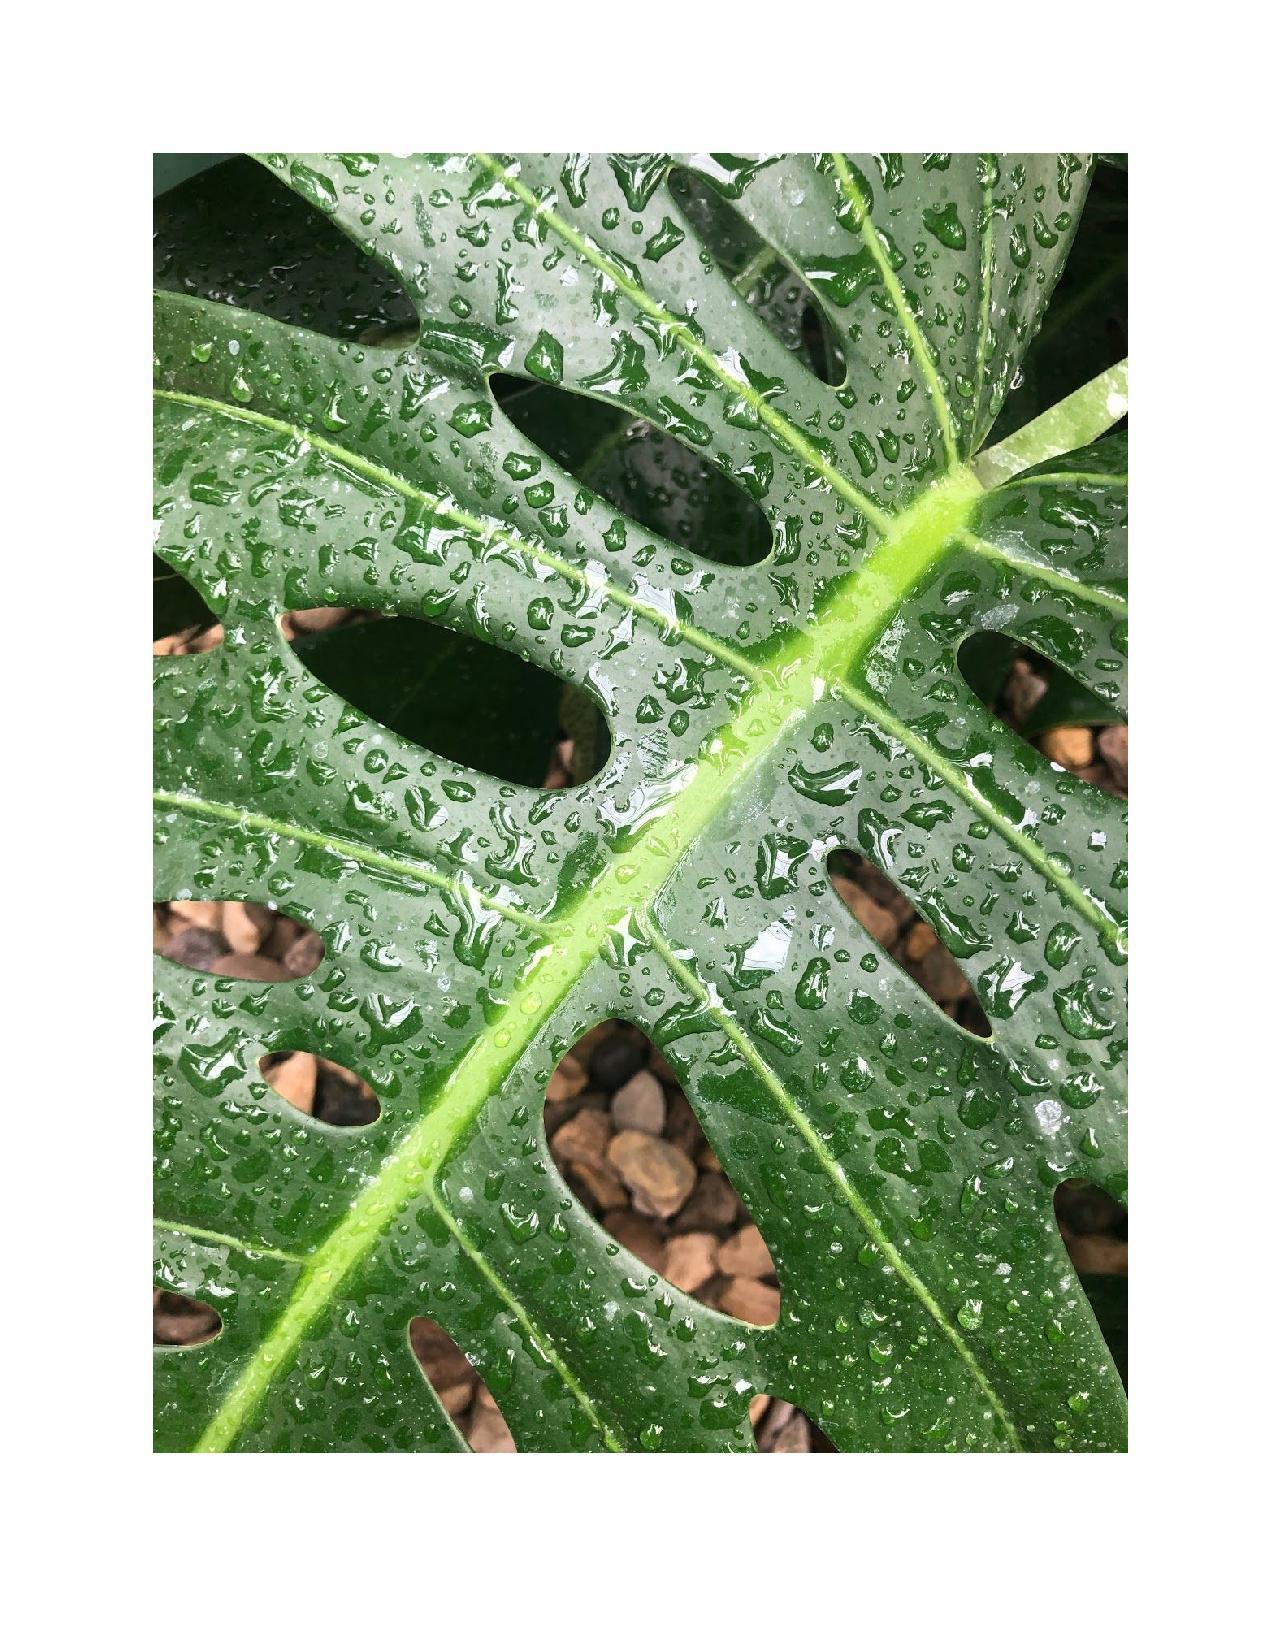 botanical cloe-up of monstera